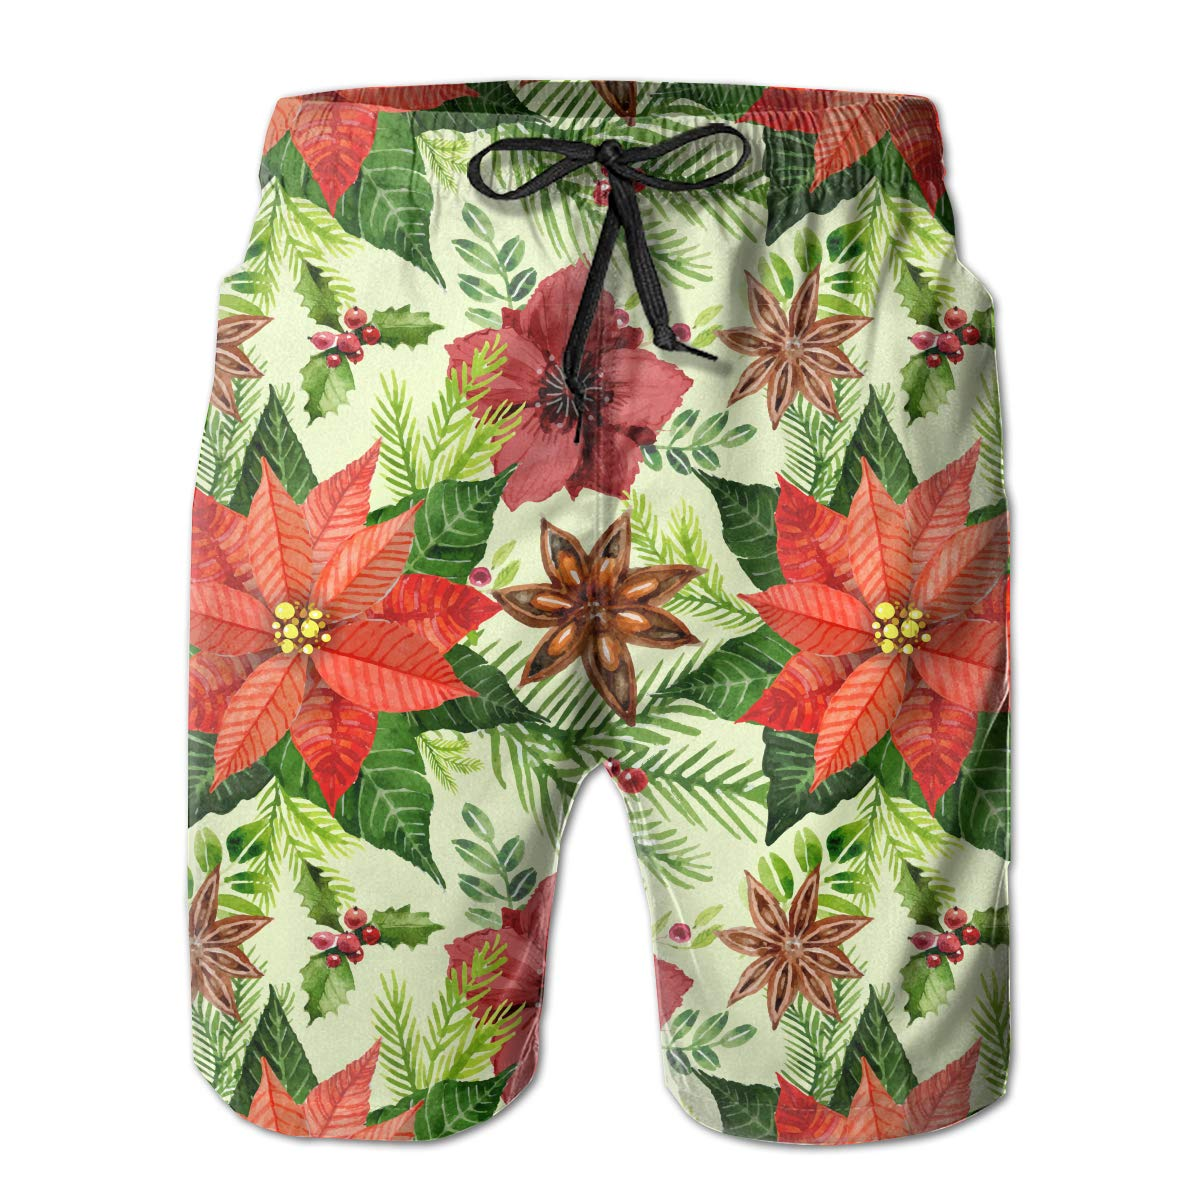 Mens Poinsettia Flower Pattern Shorts Lightweight Swim Trunks Beach Shorts,Boardshort 32